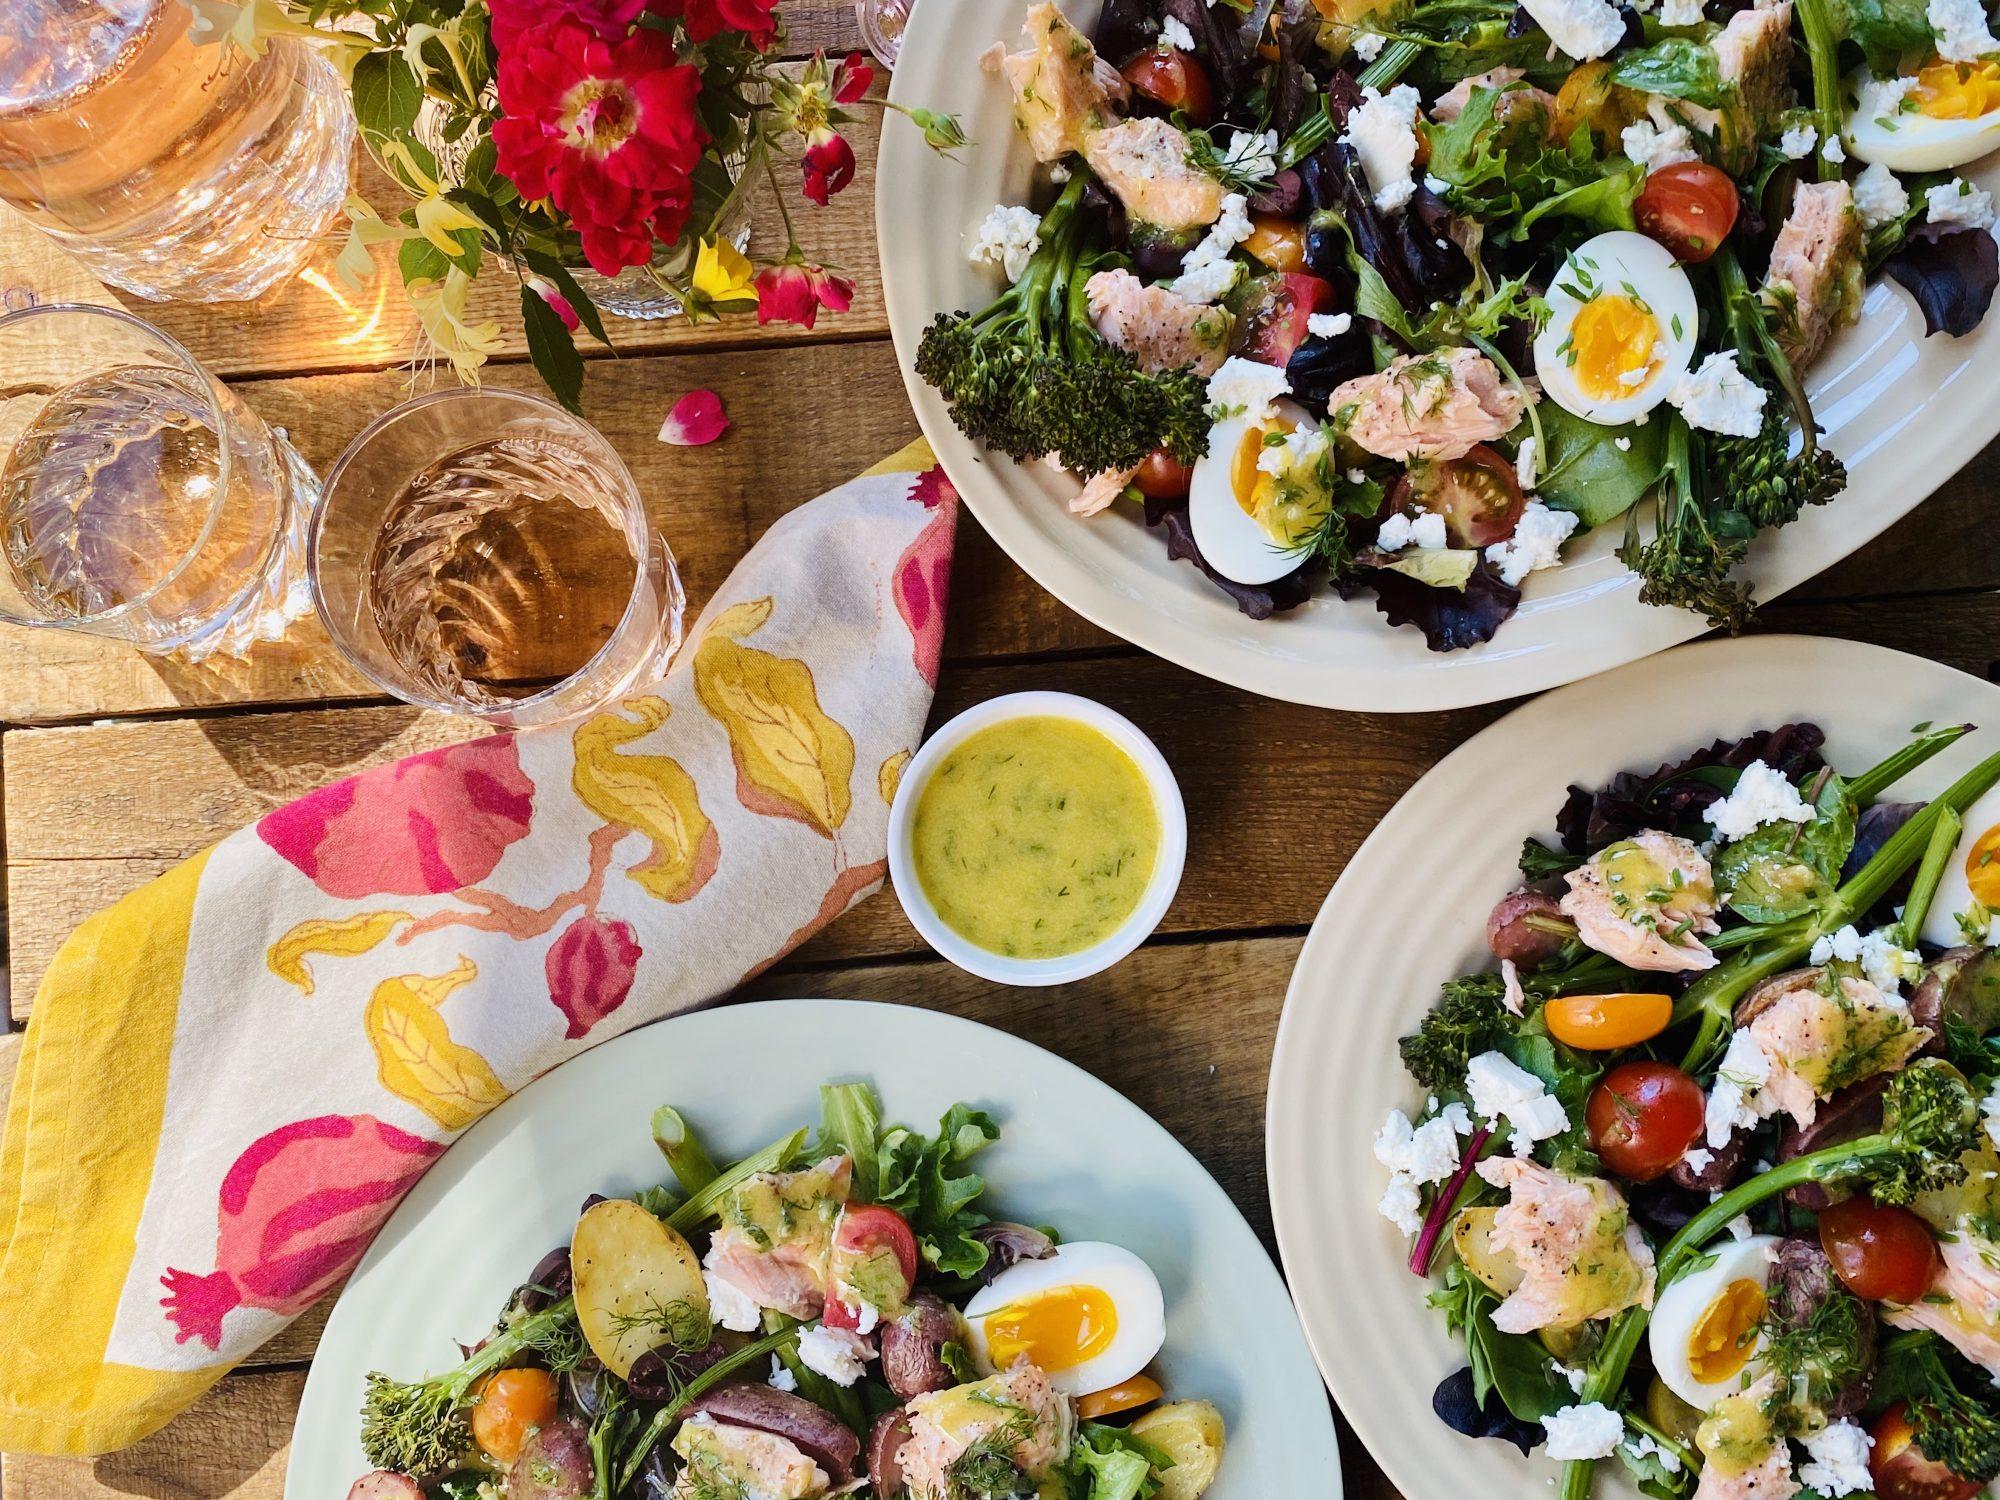 Sheet Pan Niçoise Salad